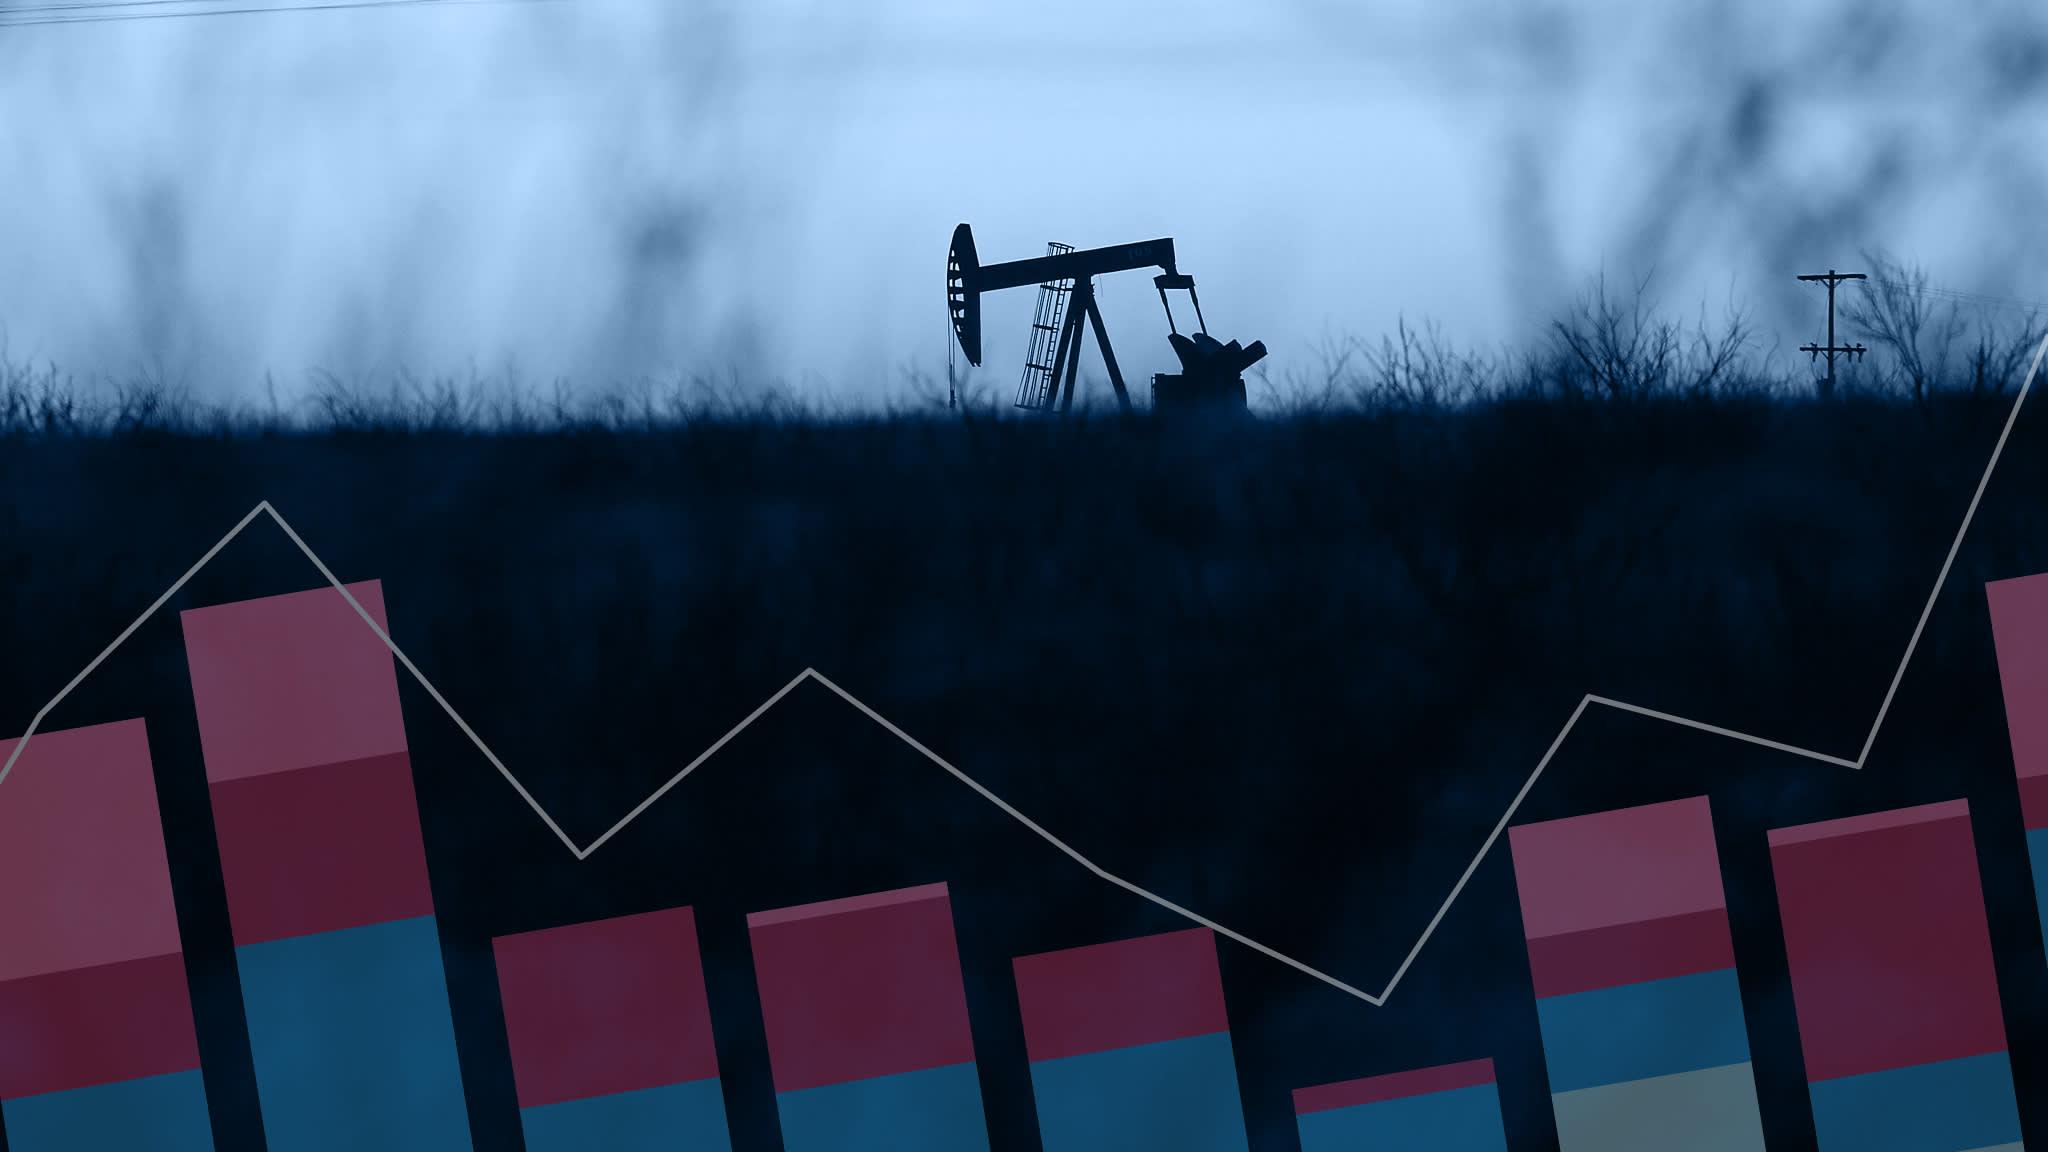 Global energy stocks hit by worries on growth outlook